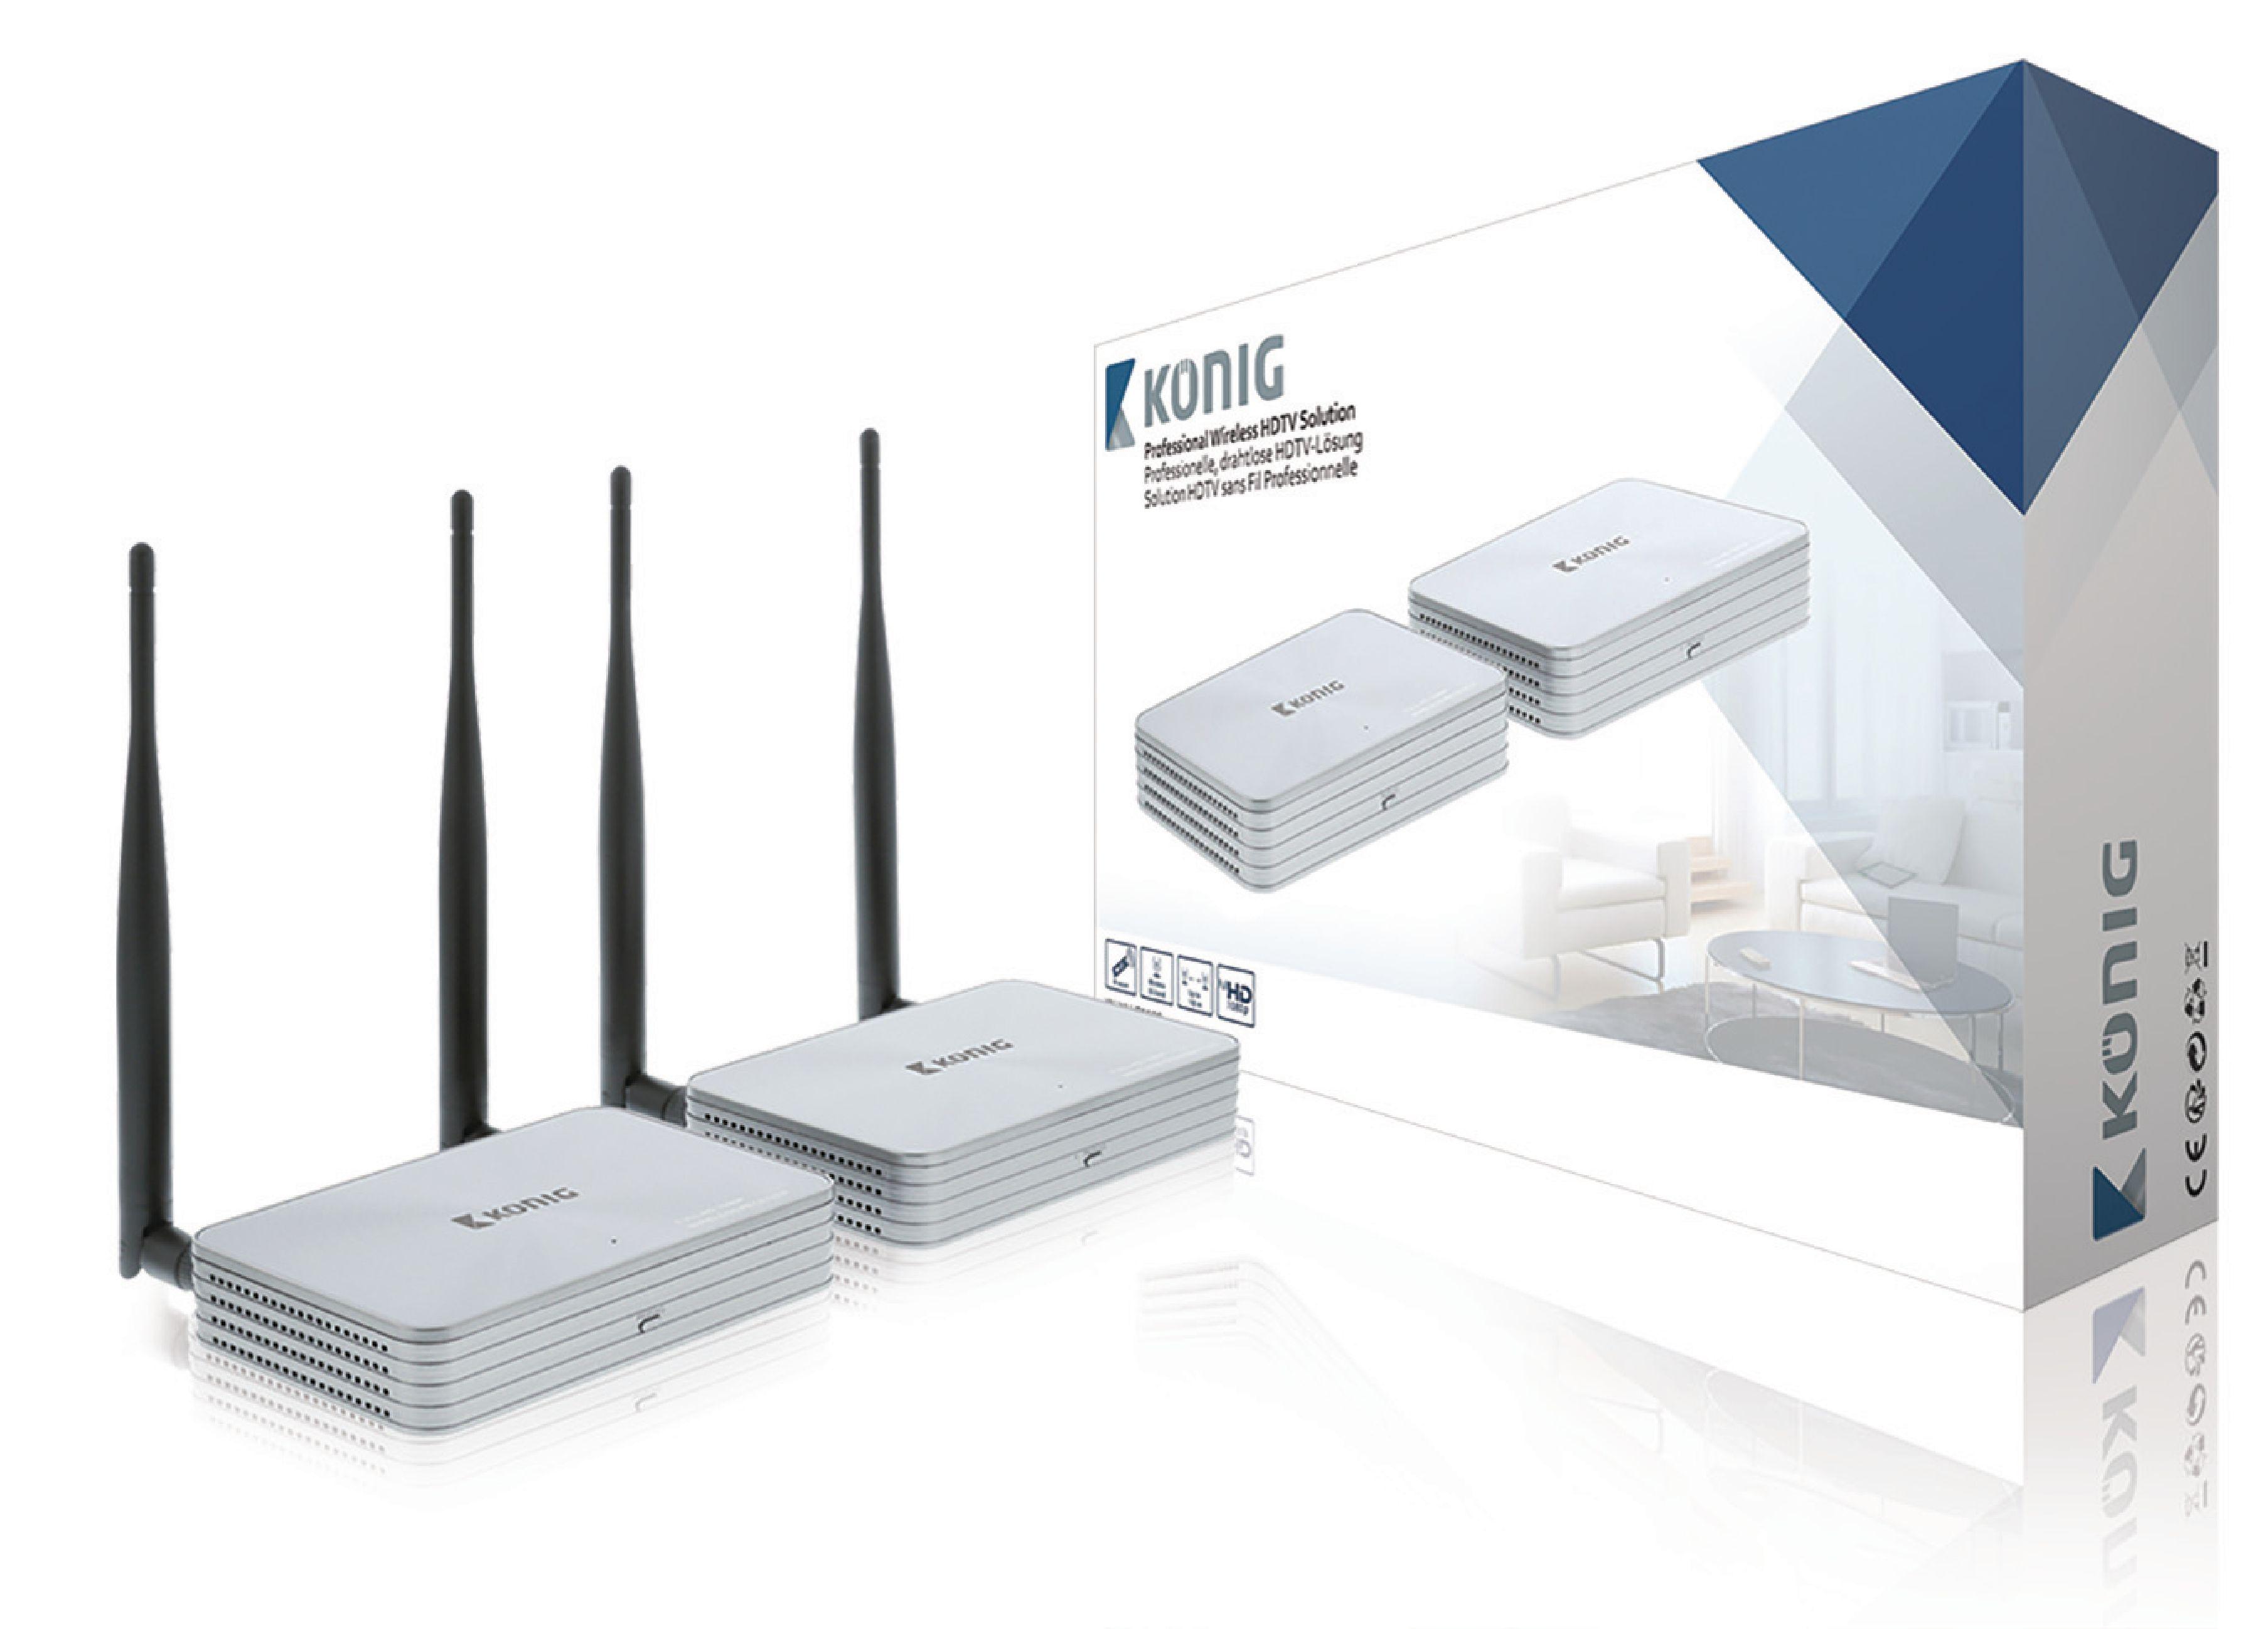 5 GHz bezdrátový transmitter HDMI 1080p do 100 m, König KN-WLHDMI20